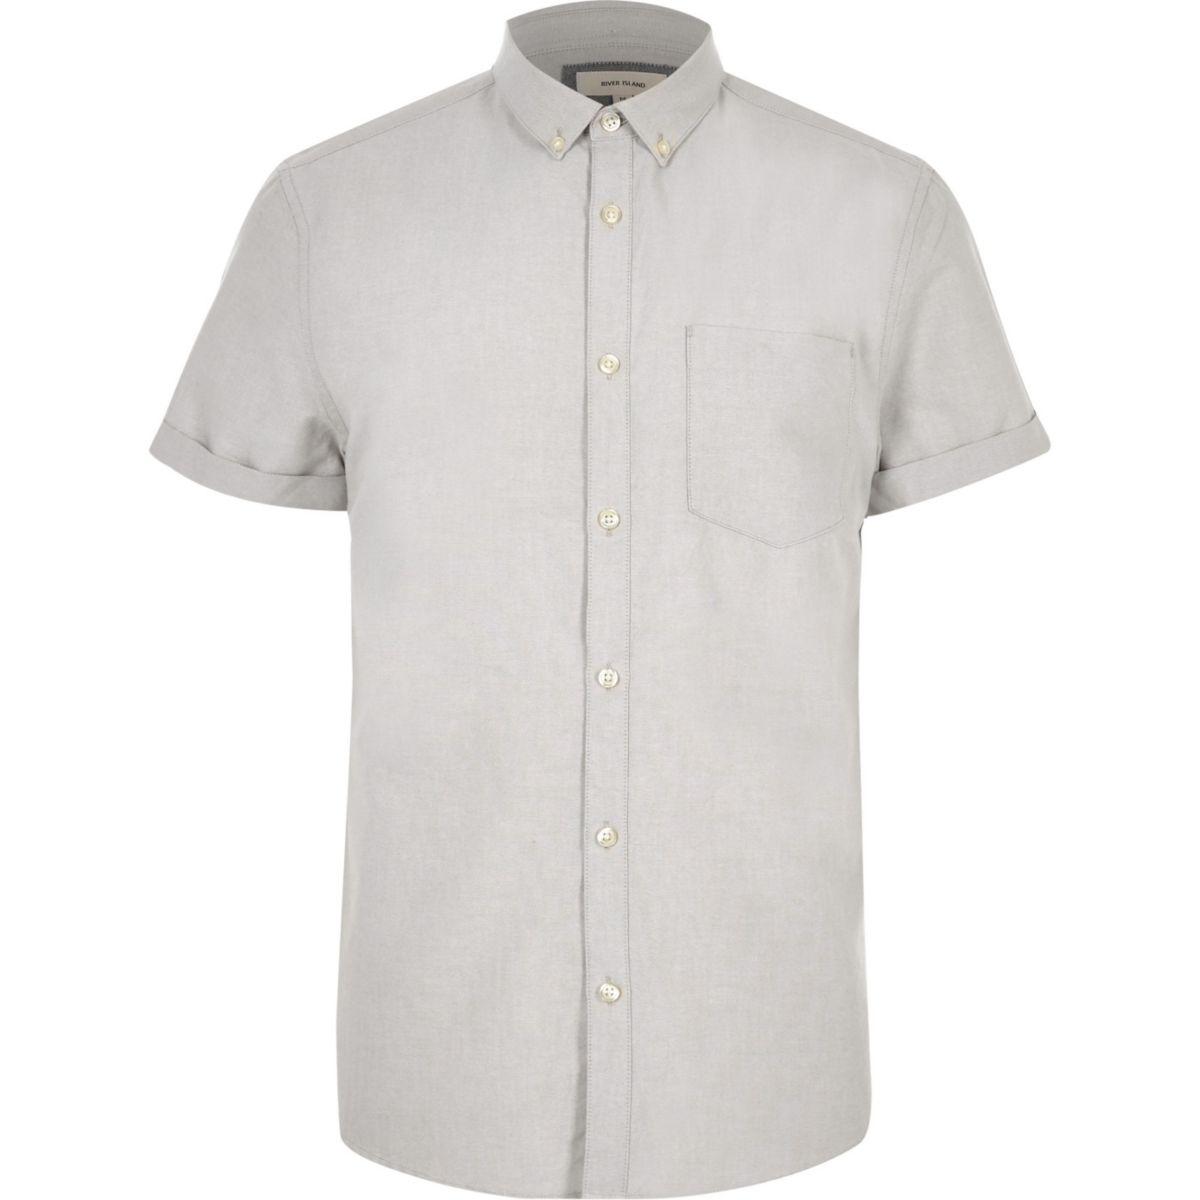 Grey casual short sleeve Oxford shirt